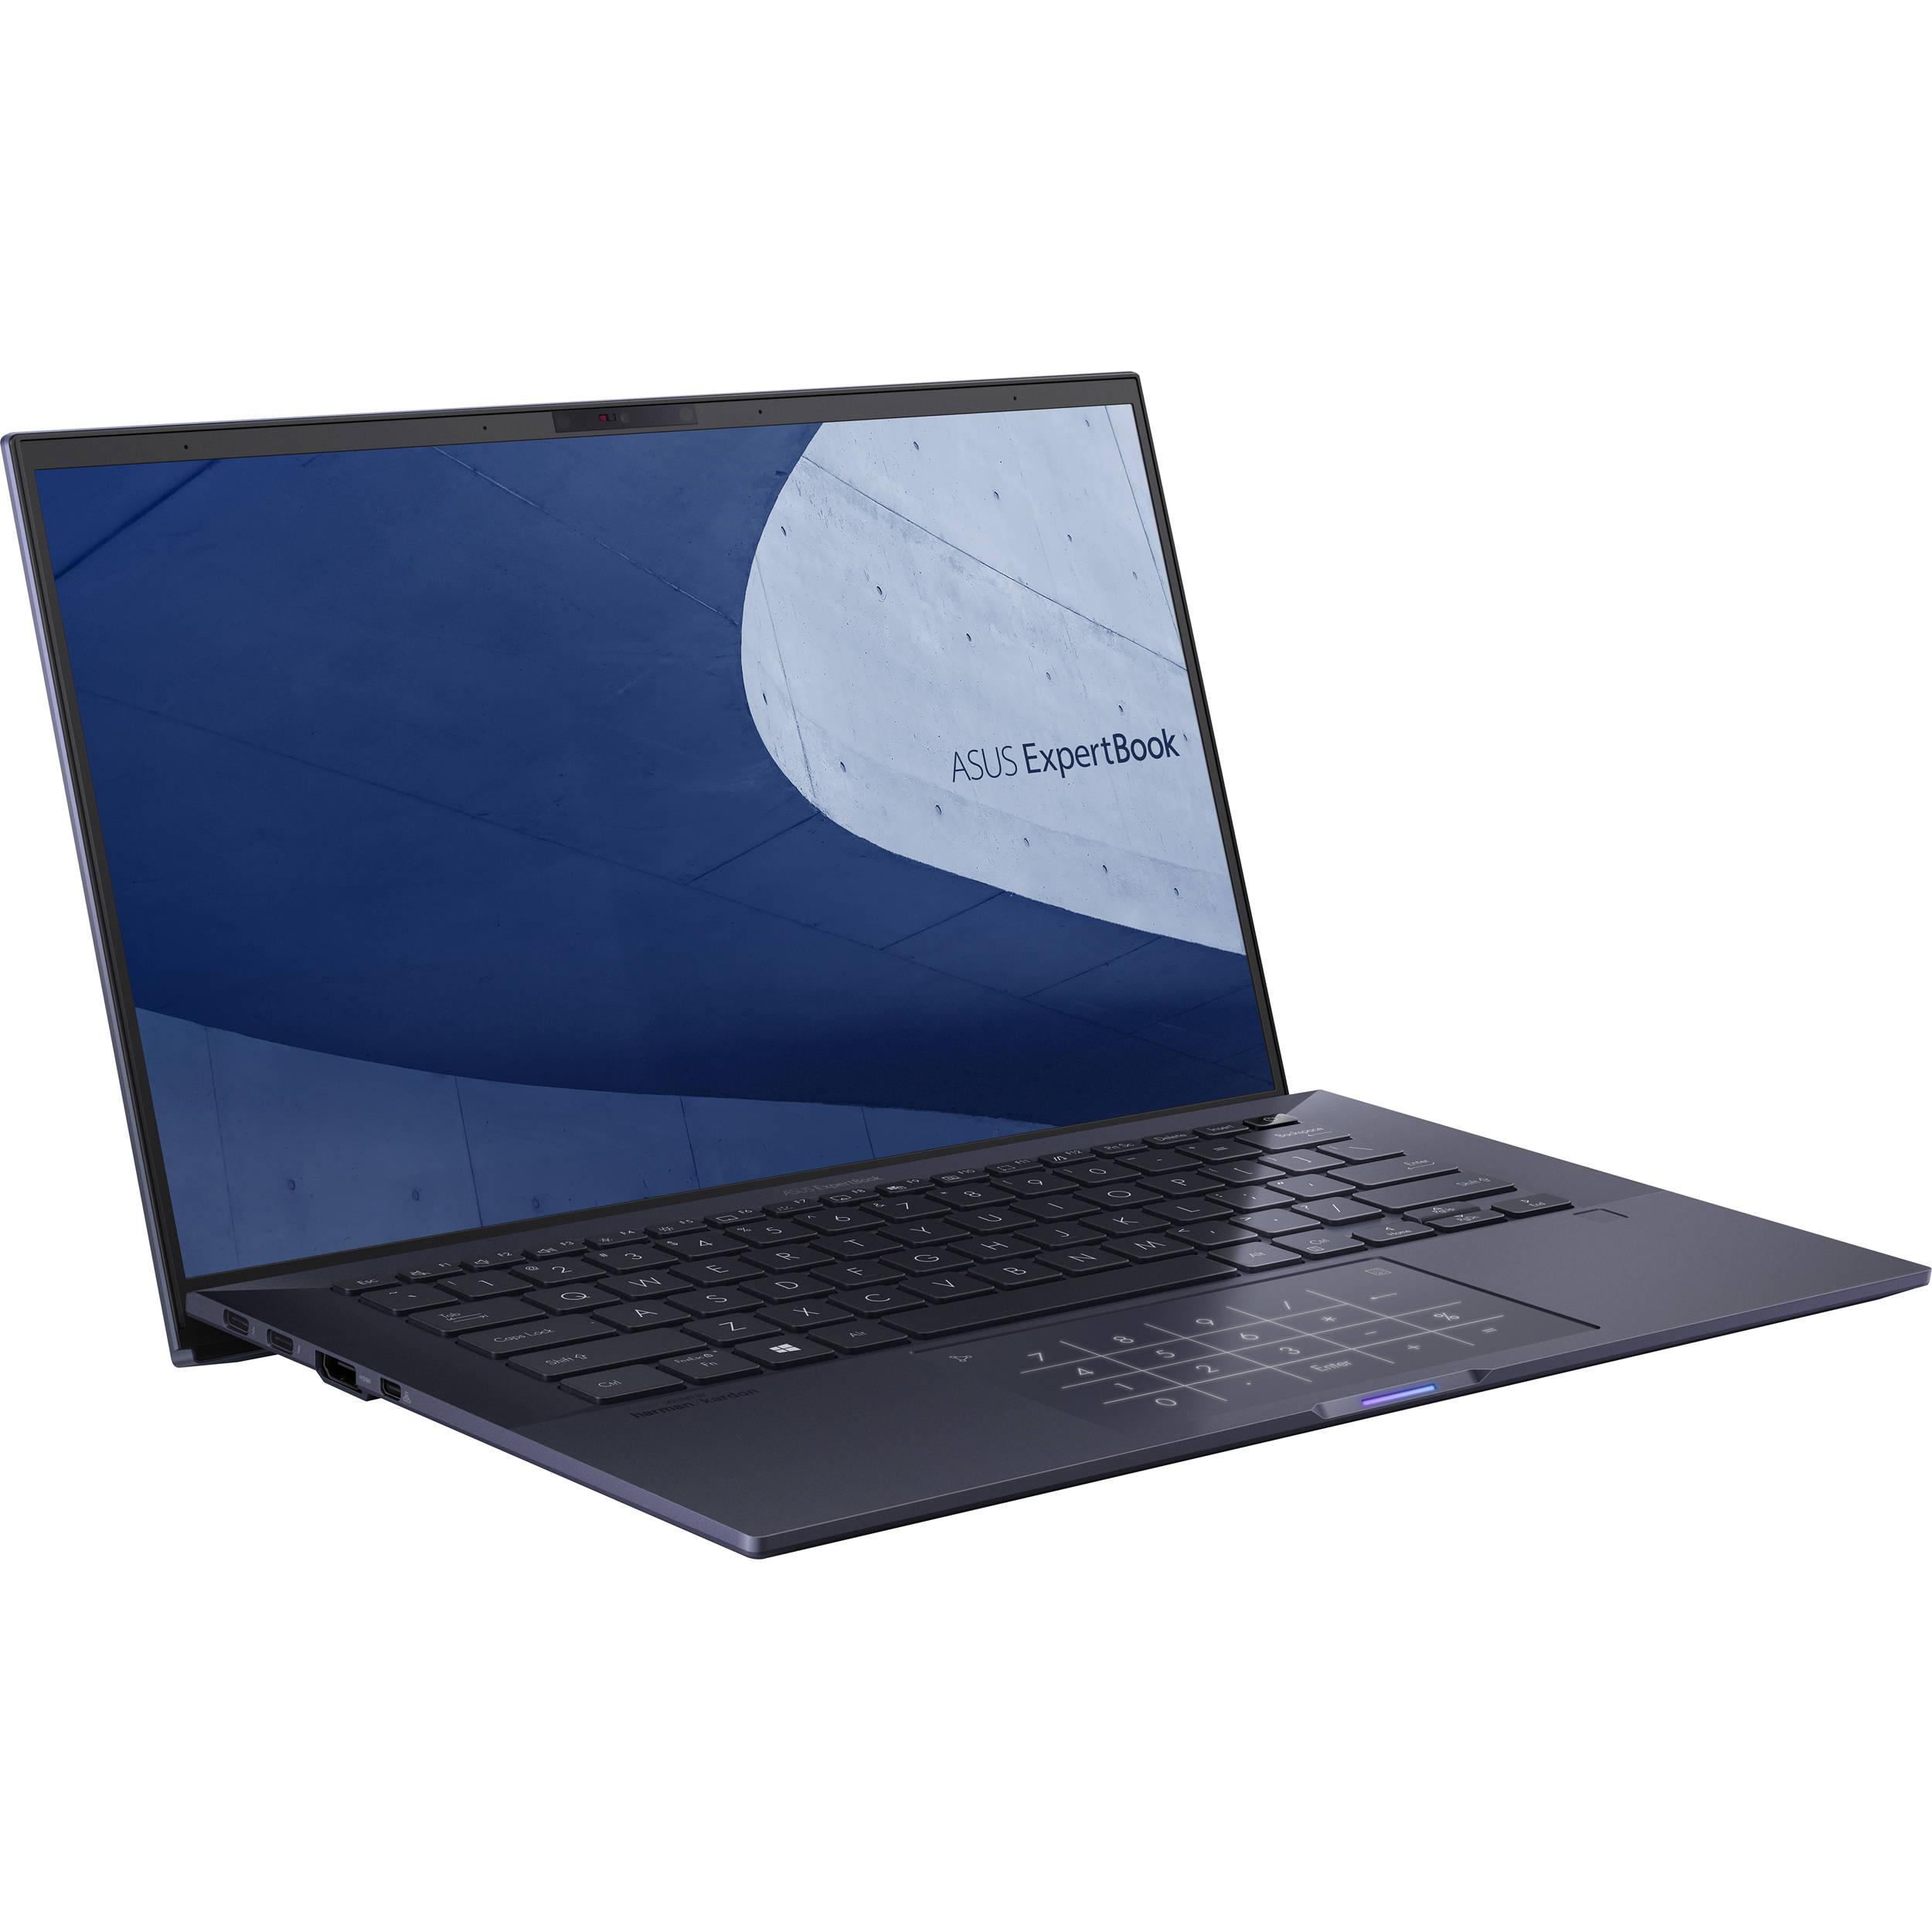 "ASUS 14"" ExpertBook B9450FA Laptop B9450FA-XS74 B&H"